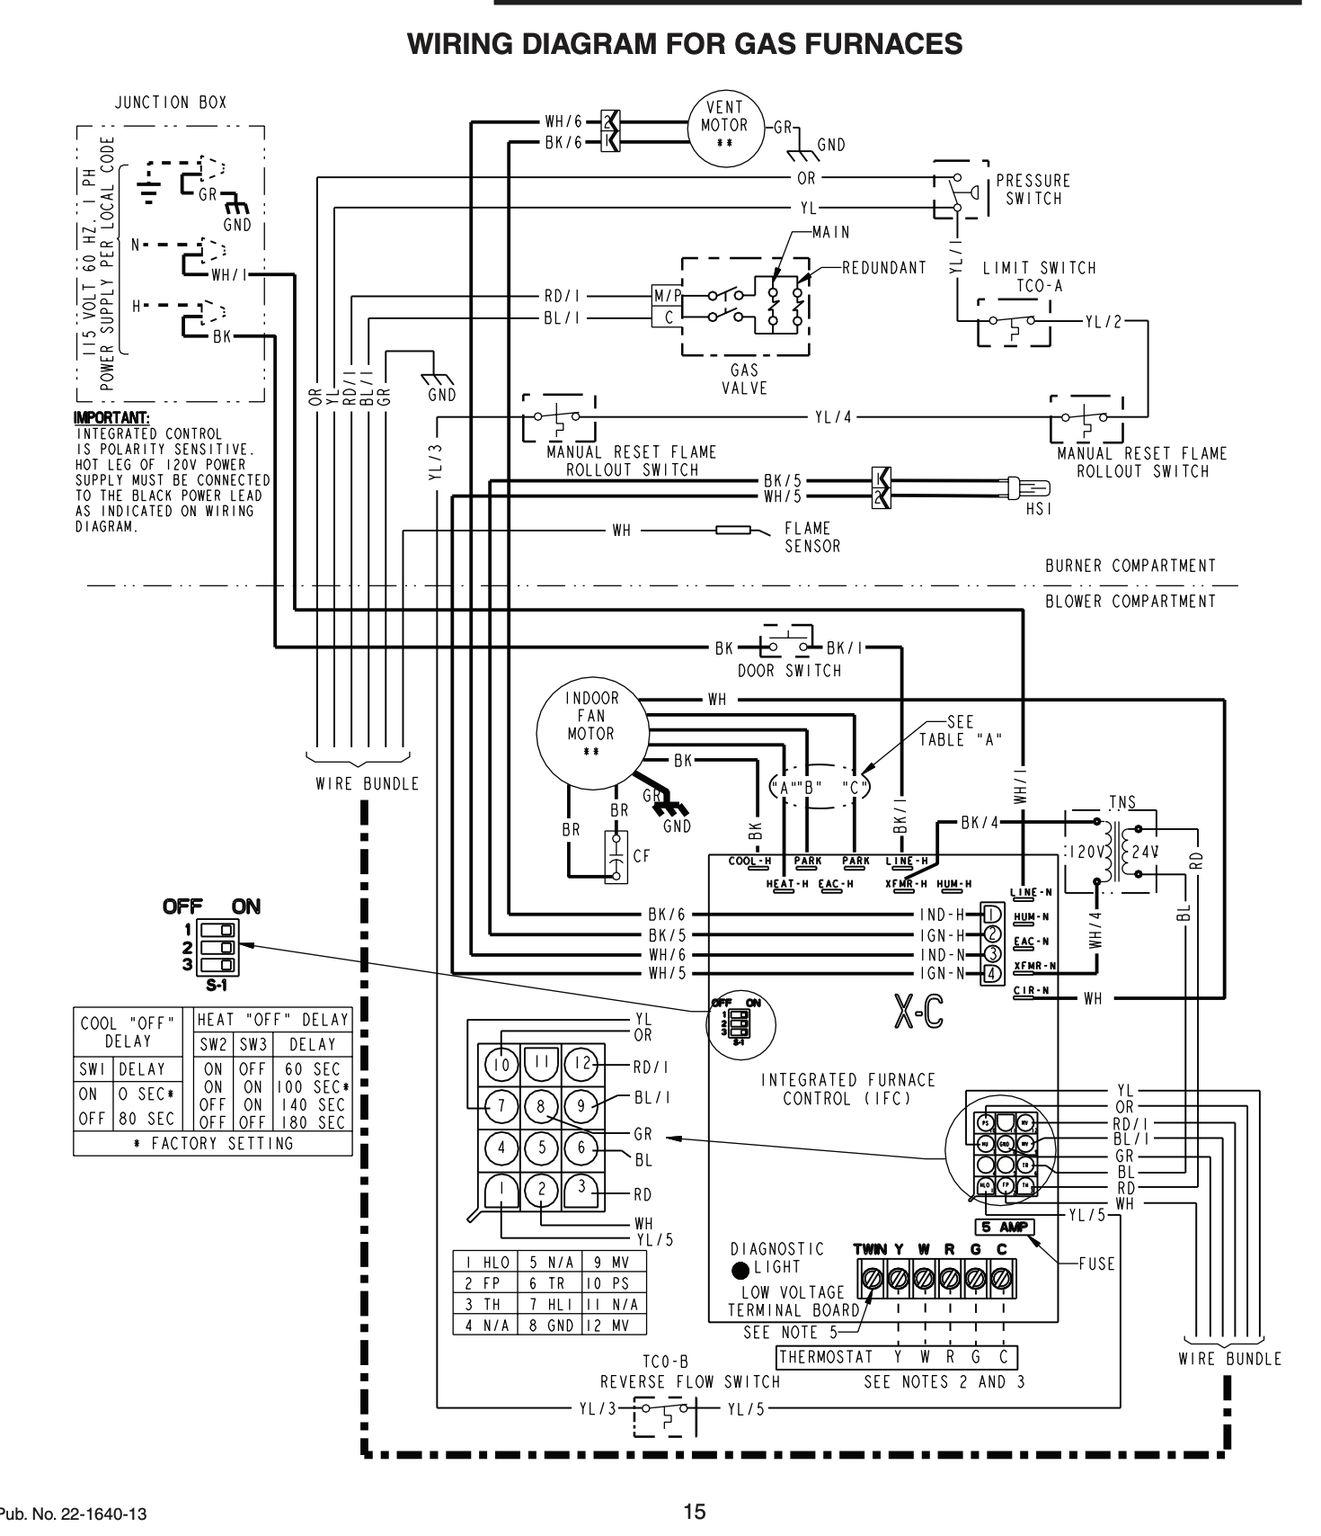 boiler flow switch wiring diagram